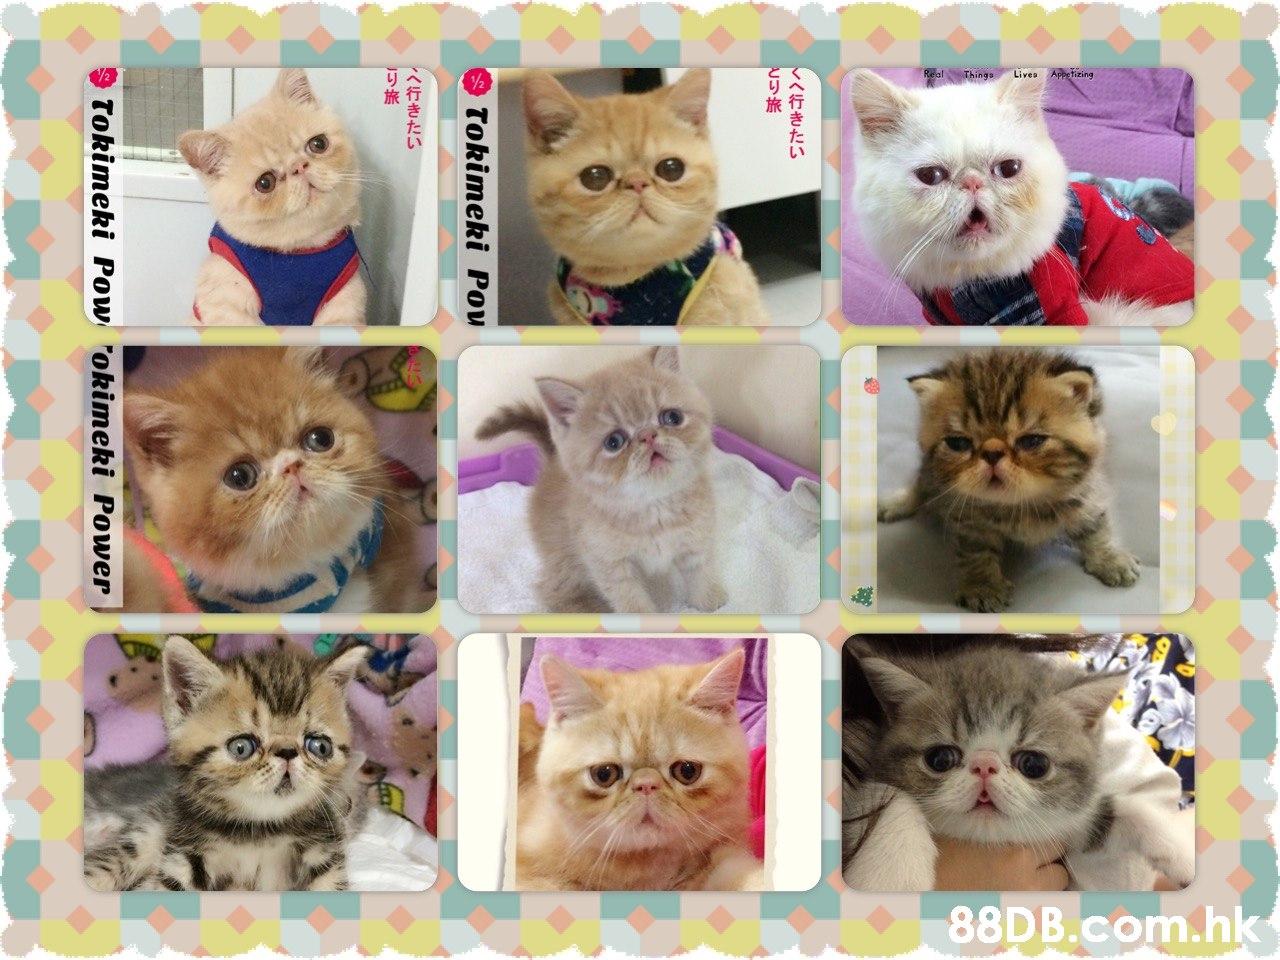 alThings Lives Aiing .hk くへ行きたい Tokimeki Pou へ行きたい Tokimeki Pow okimeki Power  Cat,Felidae,Small to medium-sized cats,Kitten,Persian